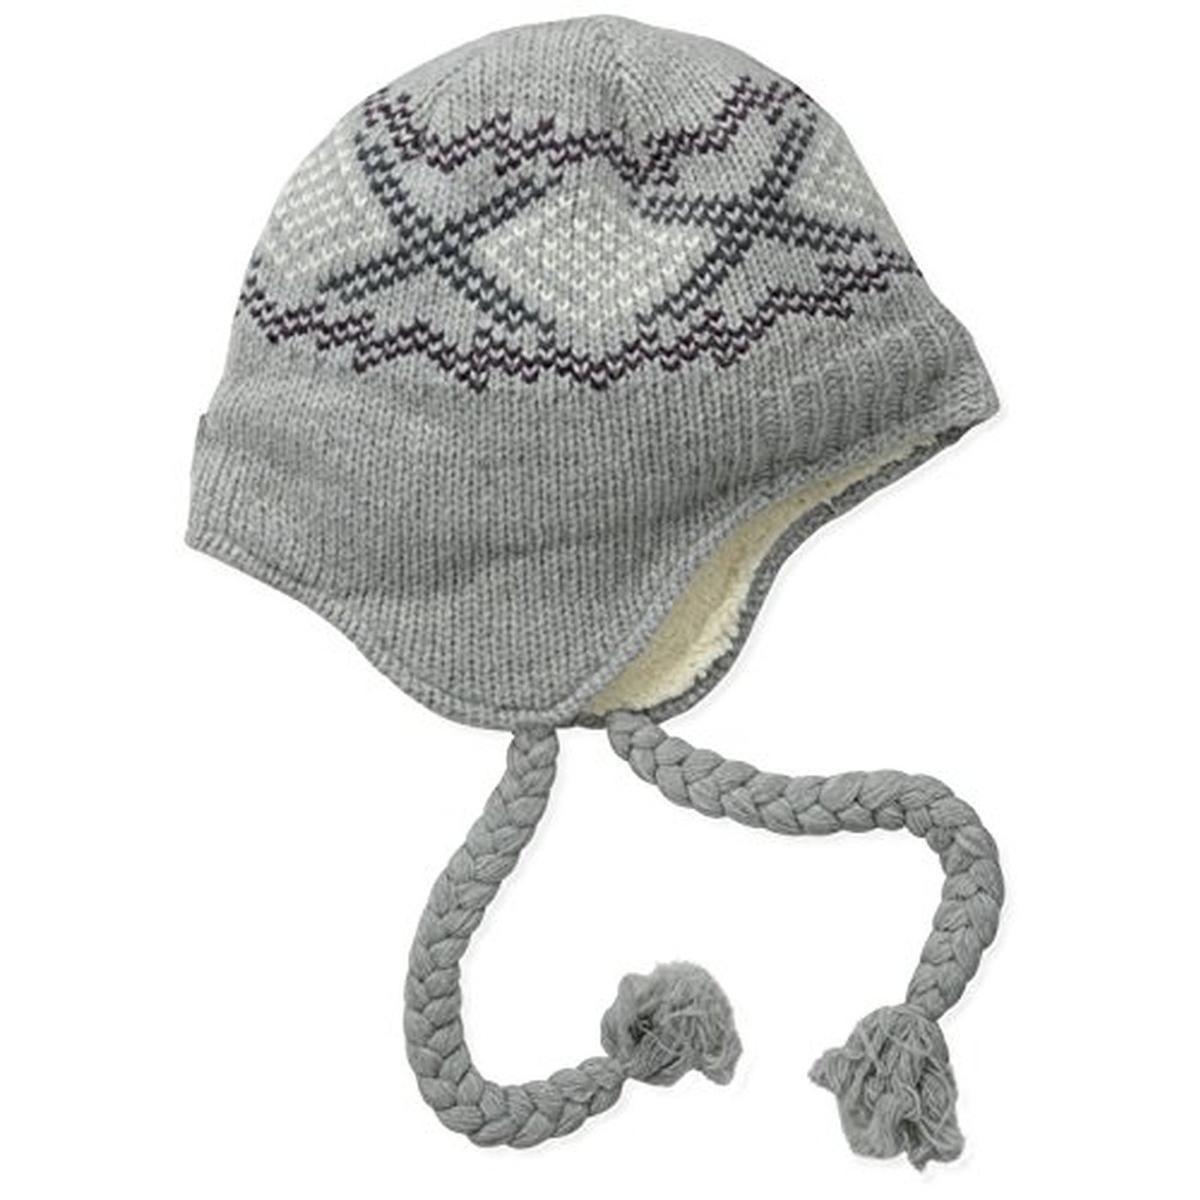 df49c003aa3d2 Carhartt 1248 Womens Gray Wool Pattern Heathered Trapper Hat O S Bhfo